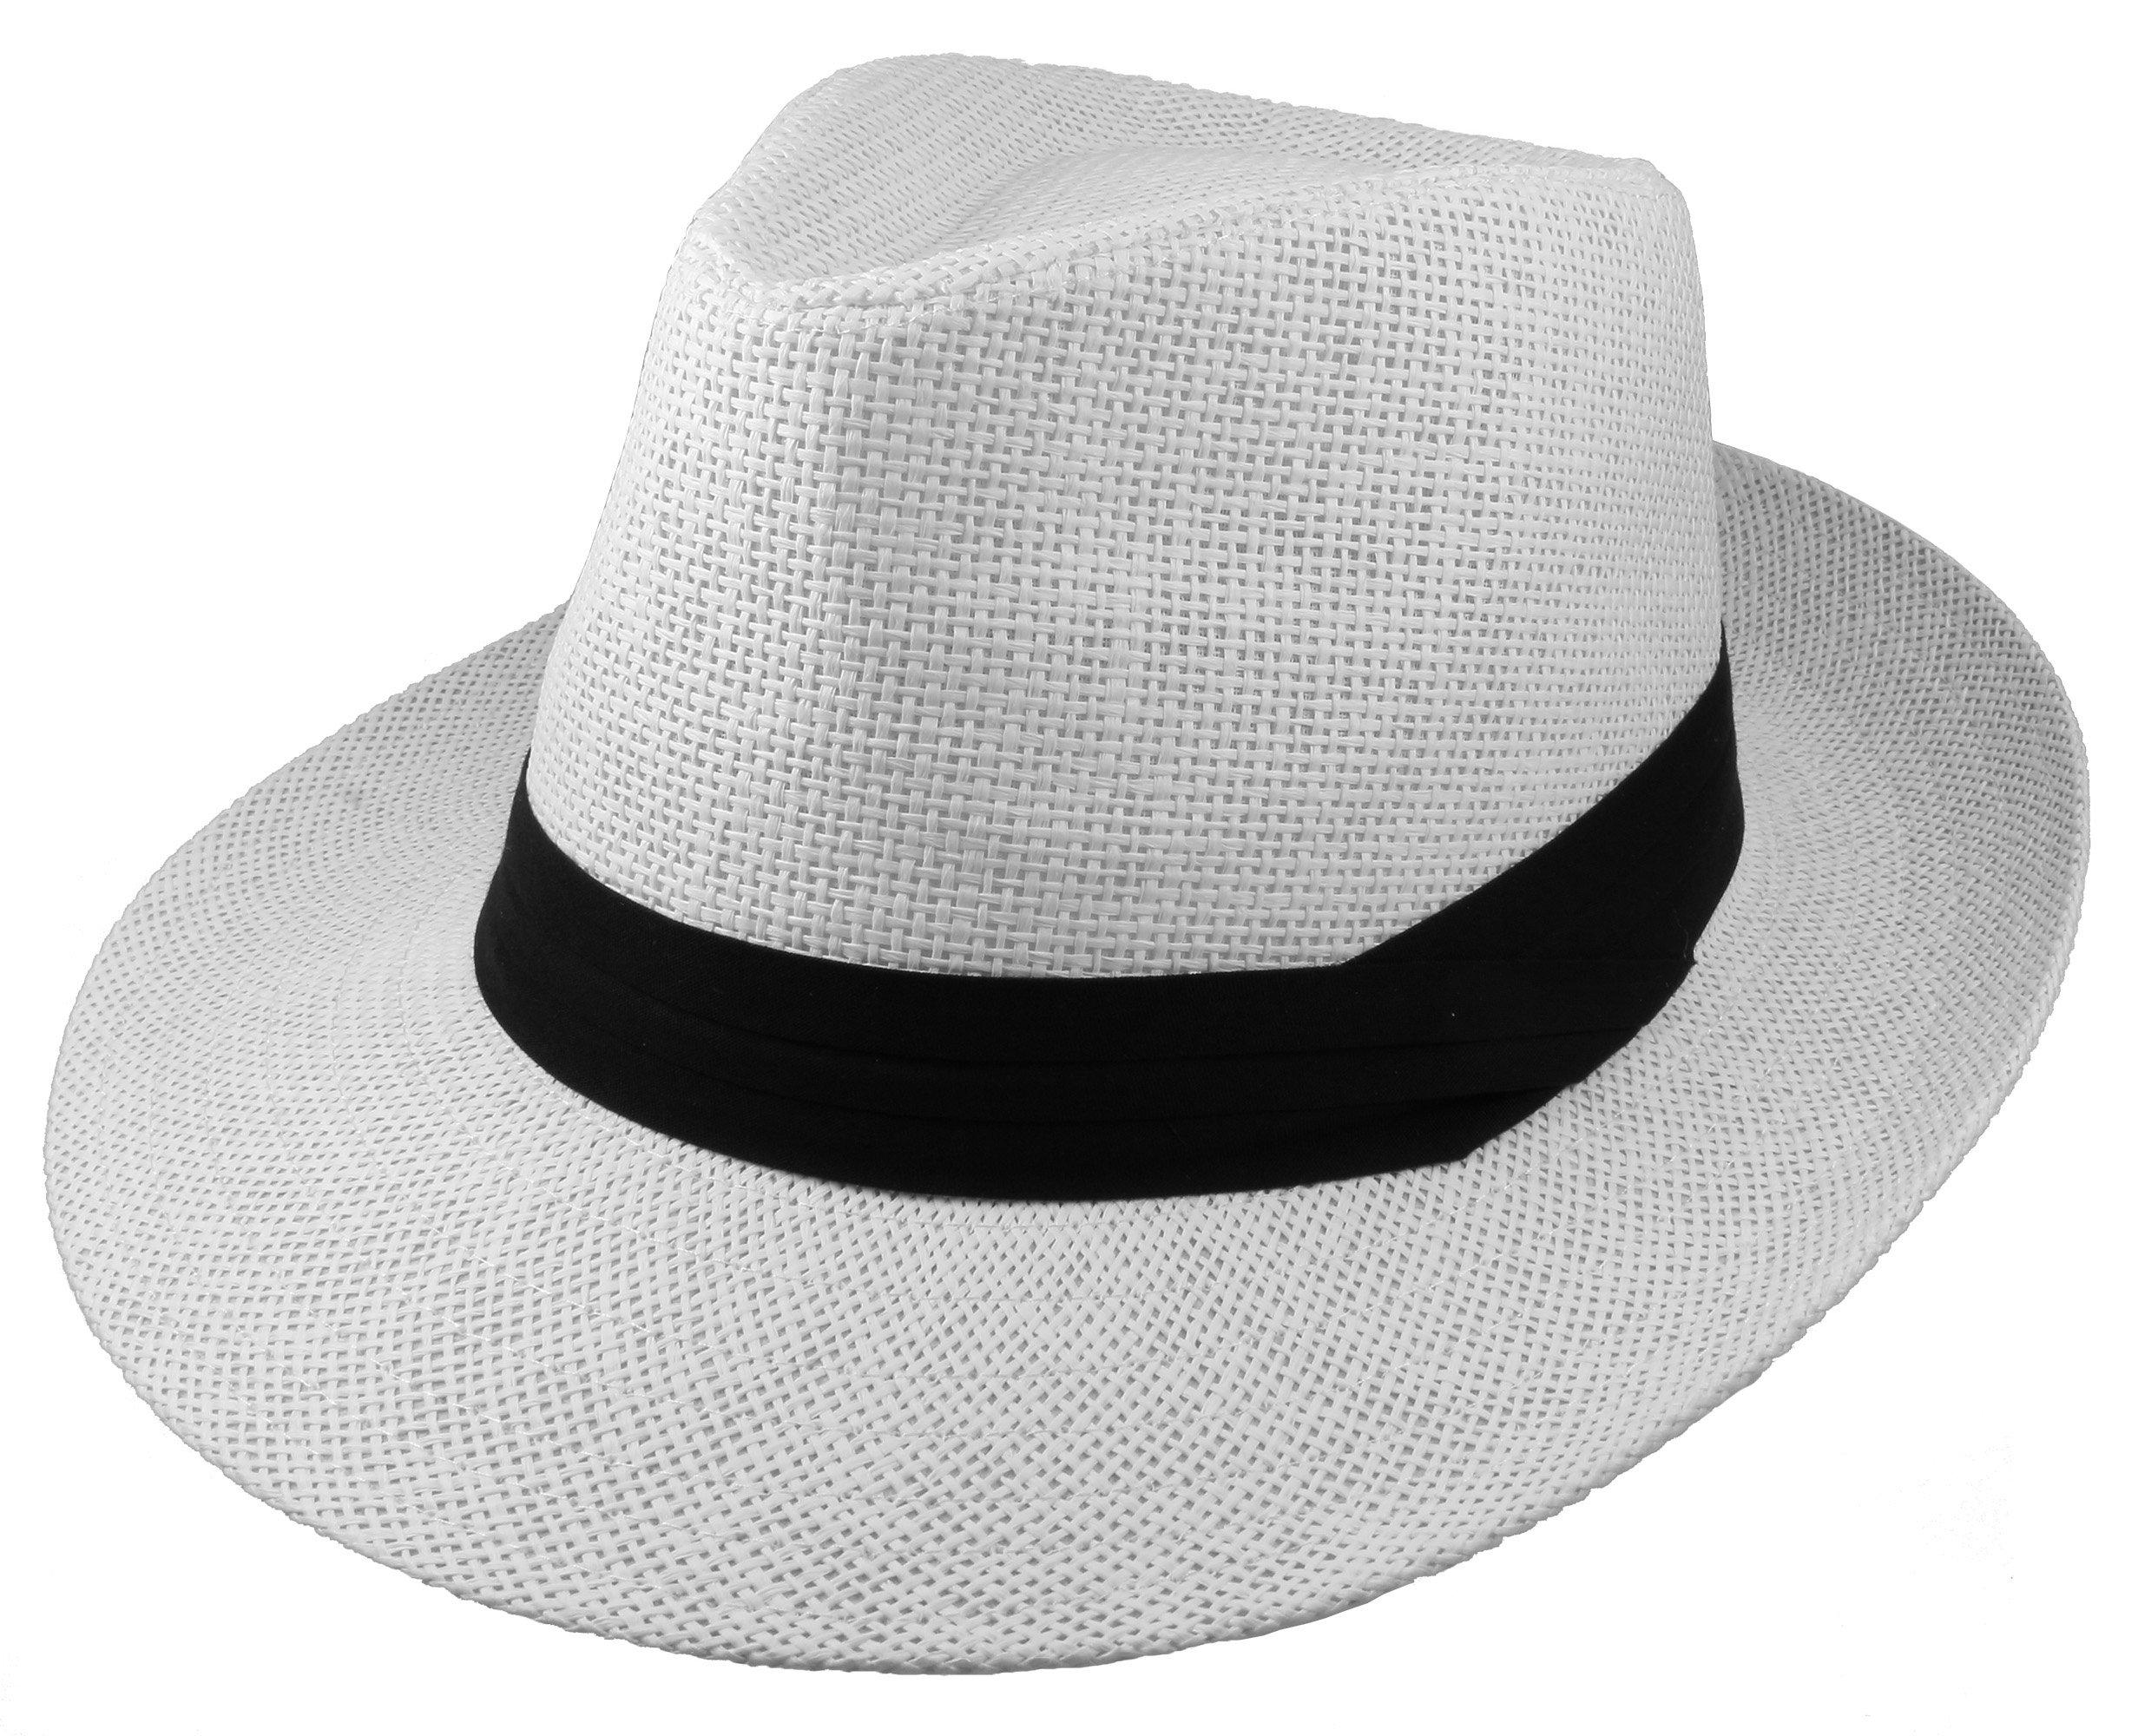 Gelante Wide Brim Summer Fedora Panama Straw Hats with Black Band M255-White-L/XL